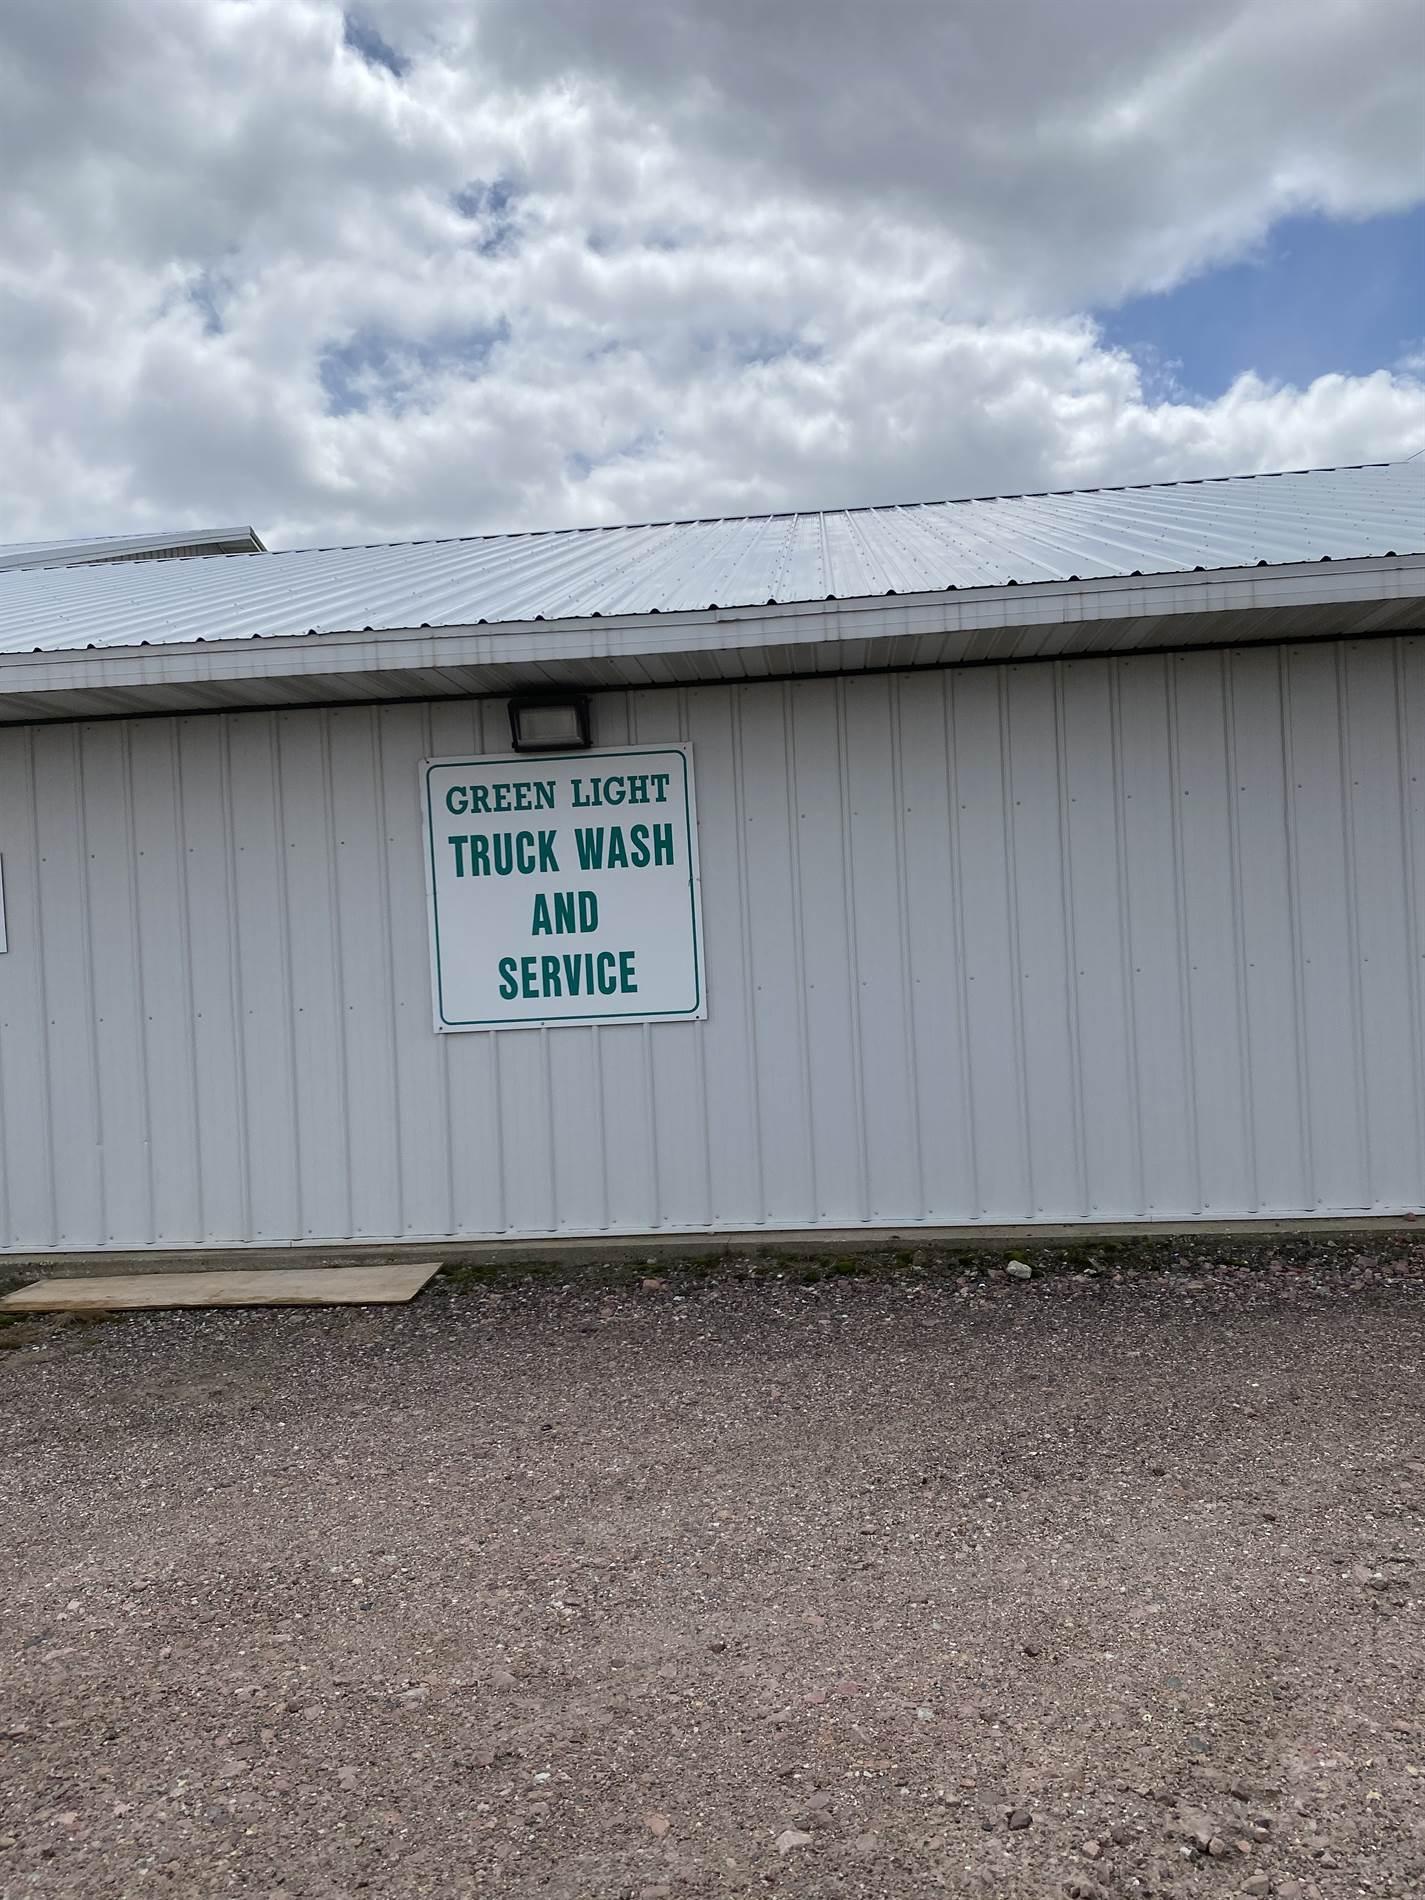 4720 S Lewis Blvd, Sioux City, IA 51106